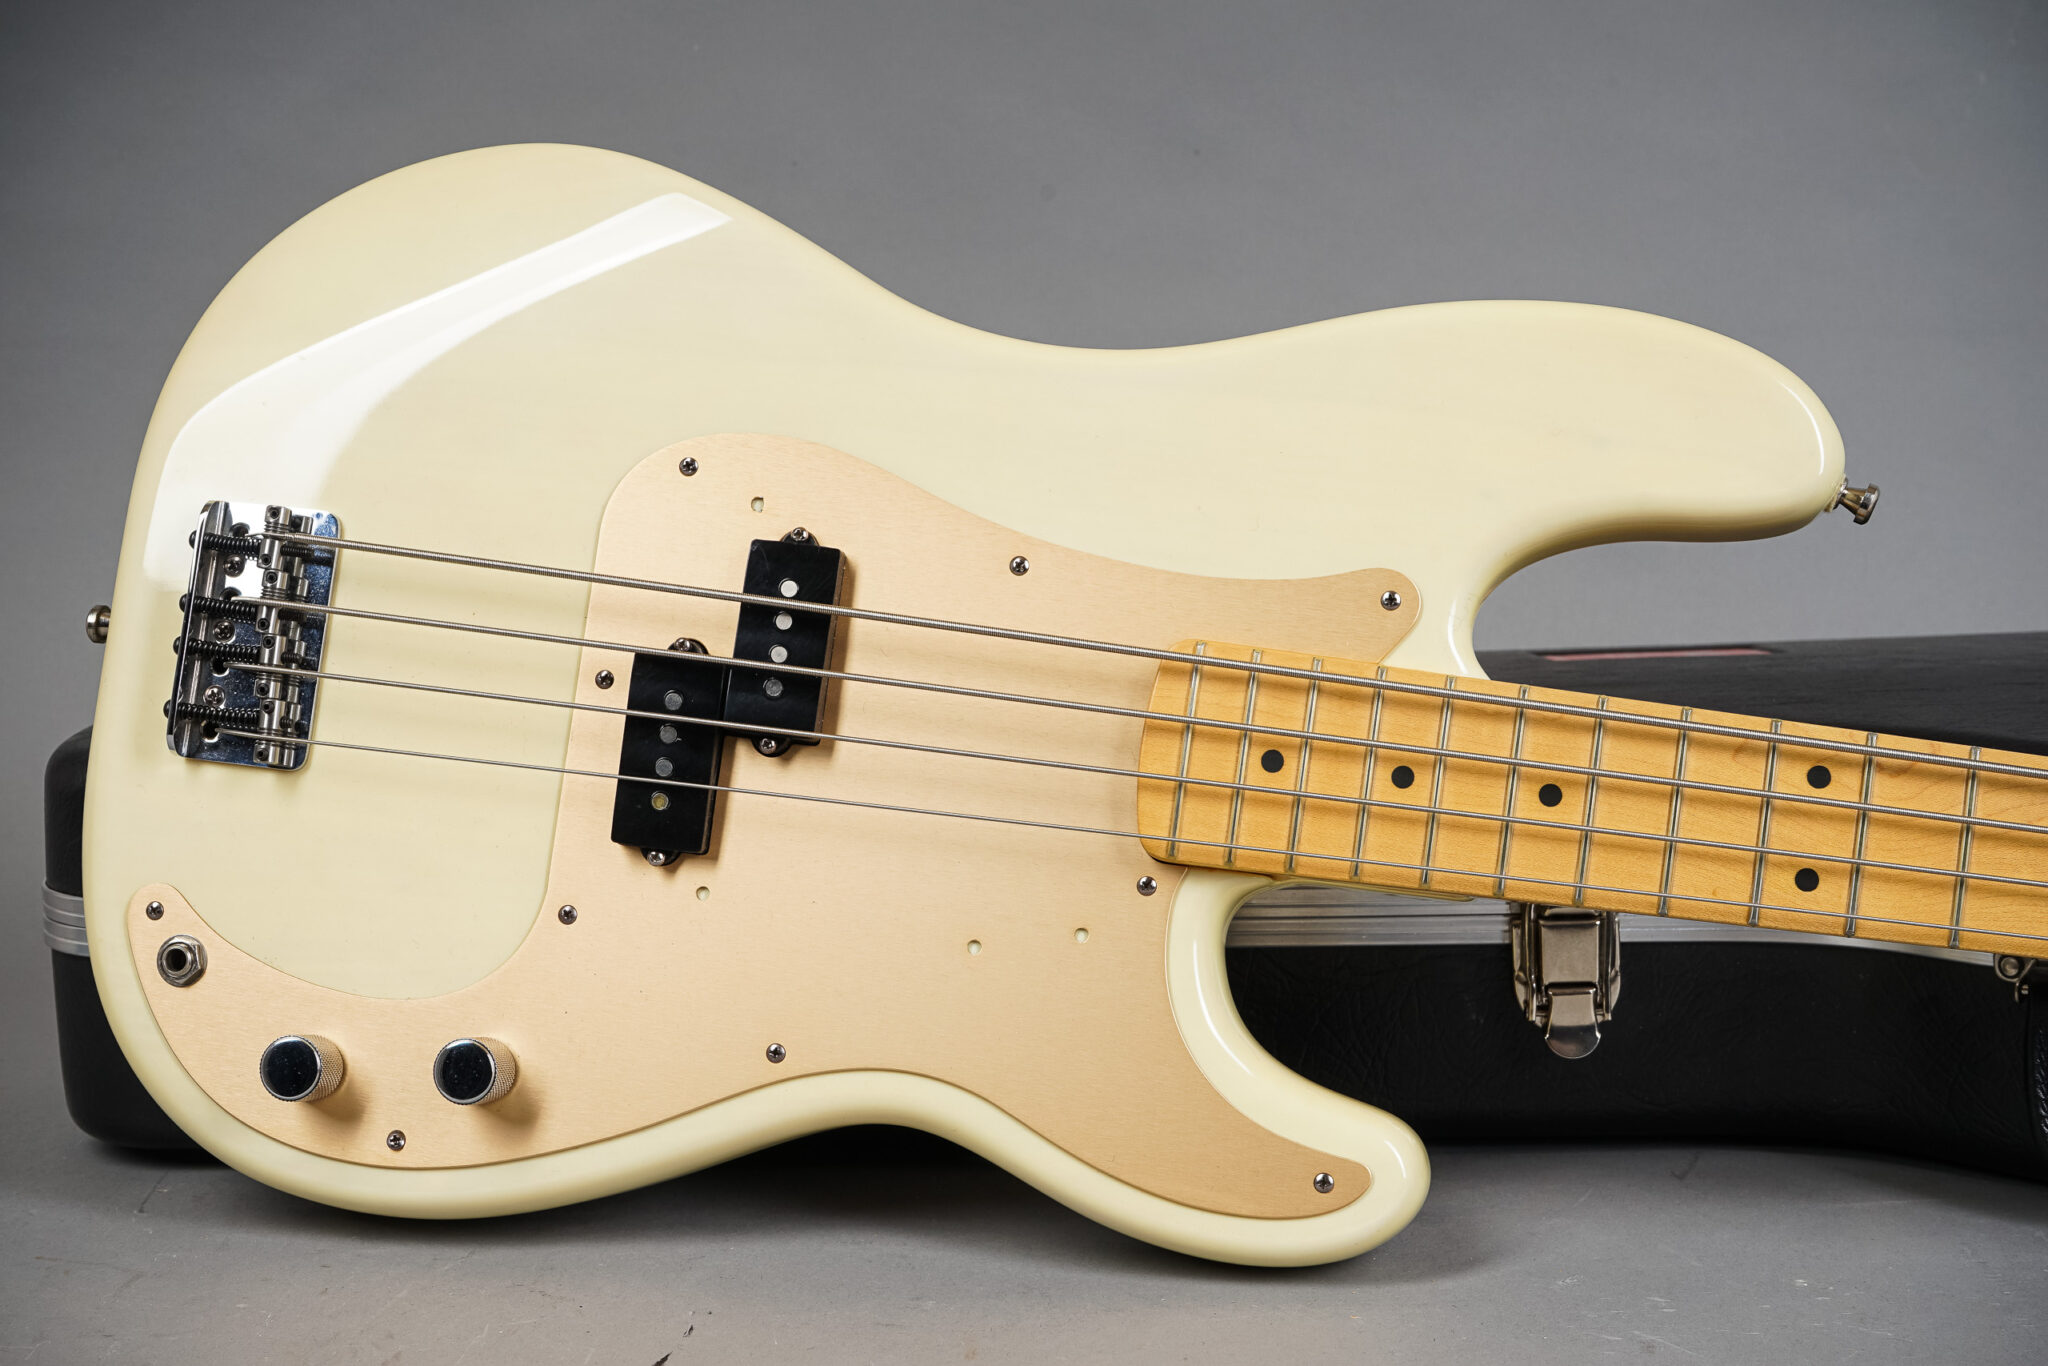 https://guitarpoint.de/app/uploads/products/1999-fender-american-standard-precision-bass-white-blonde/1999-Fender-American-P-Bass-Blond-N9401954-7-2048x1366.jpg